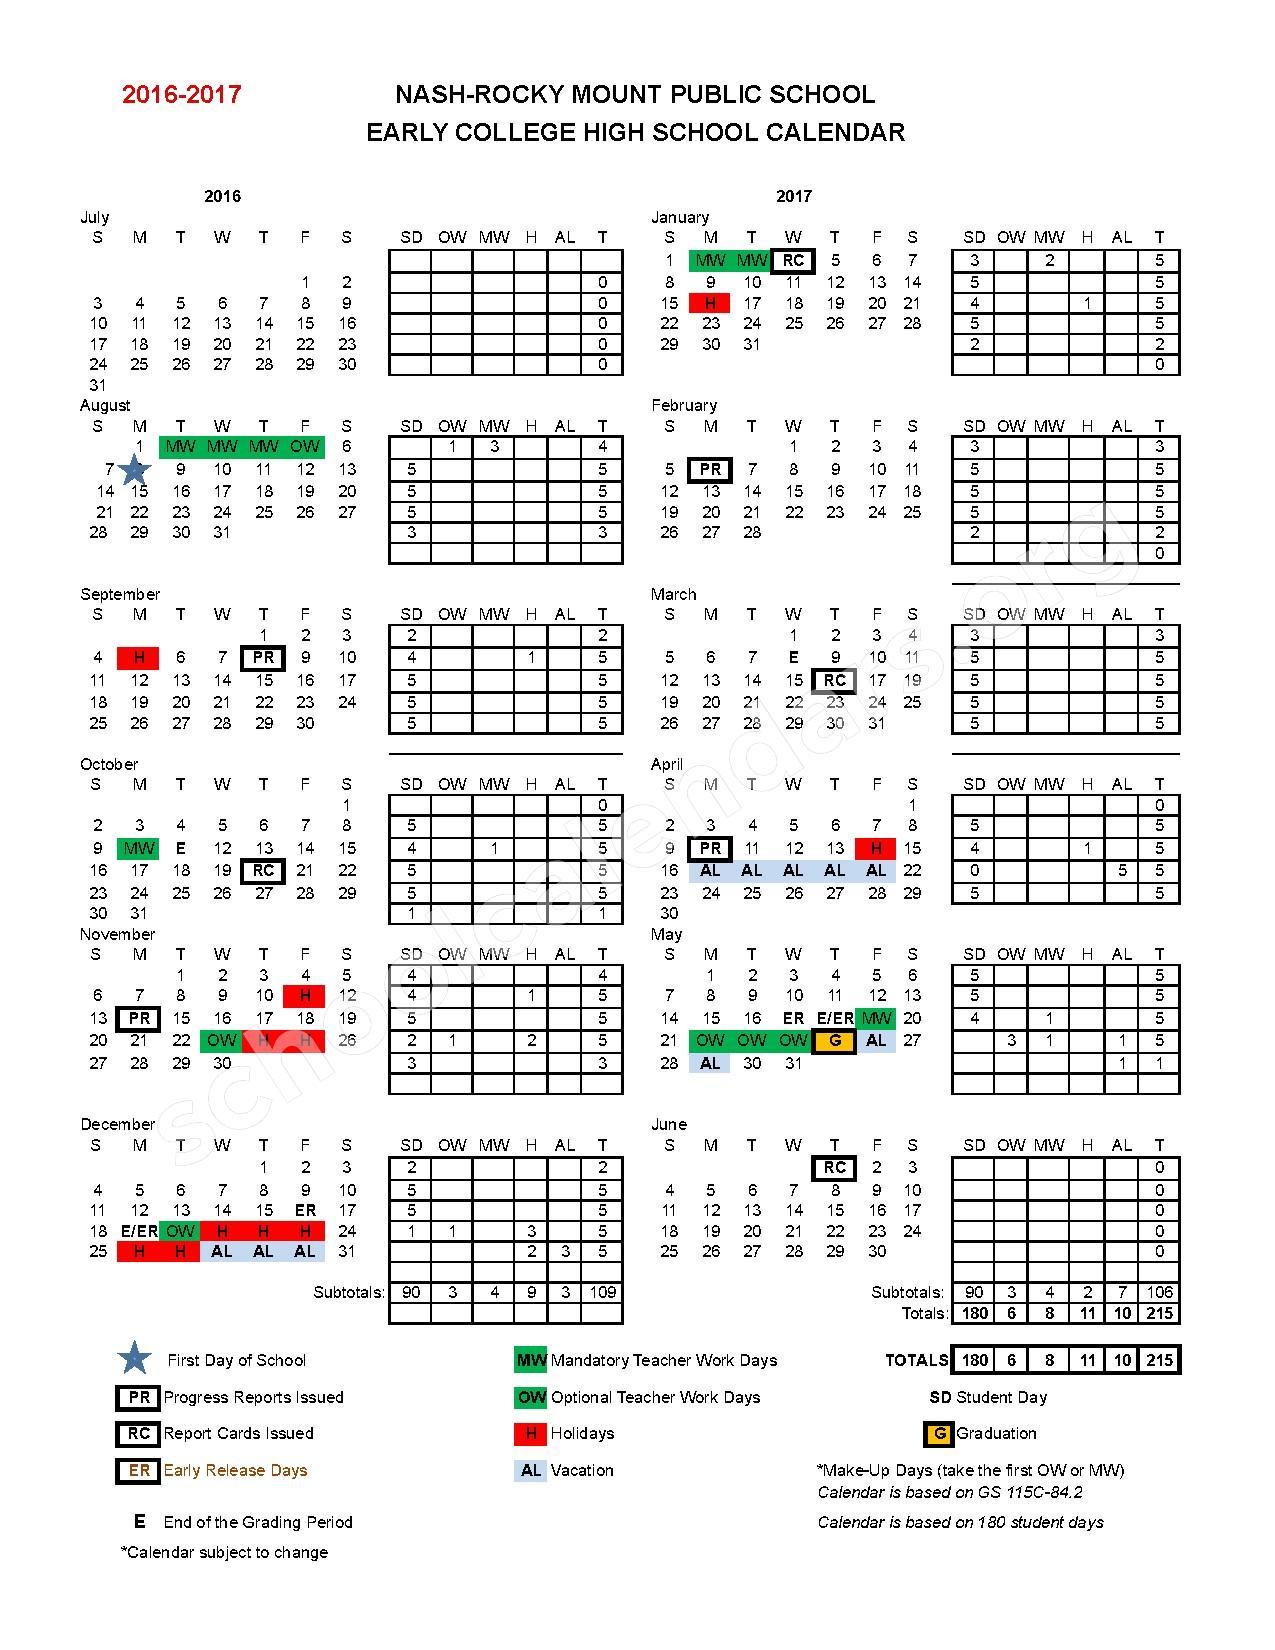 2016 - 2017 Early College High School Calendar – Nash-Rocky Mount Public Schools – page 1